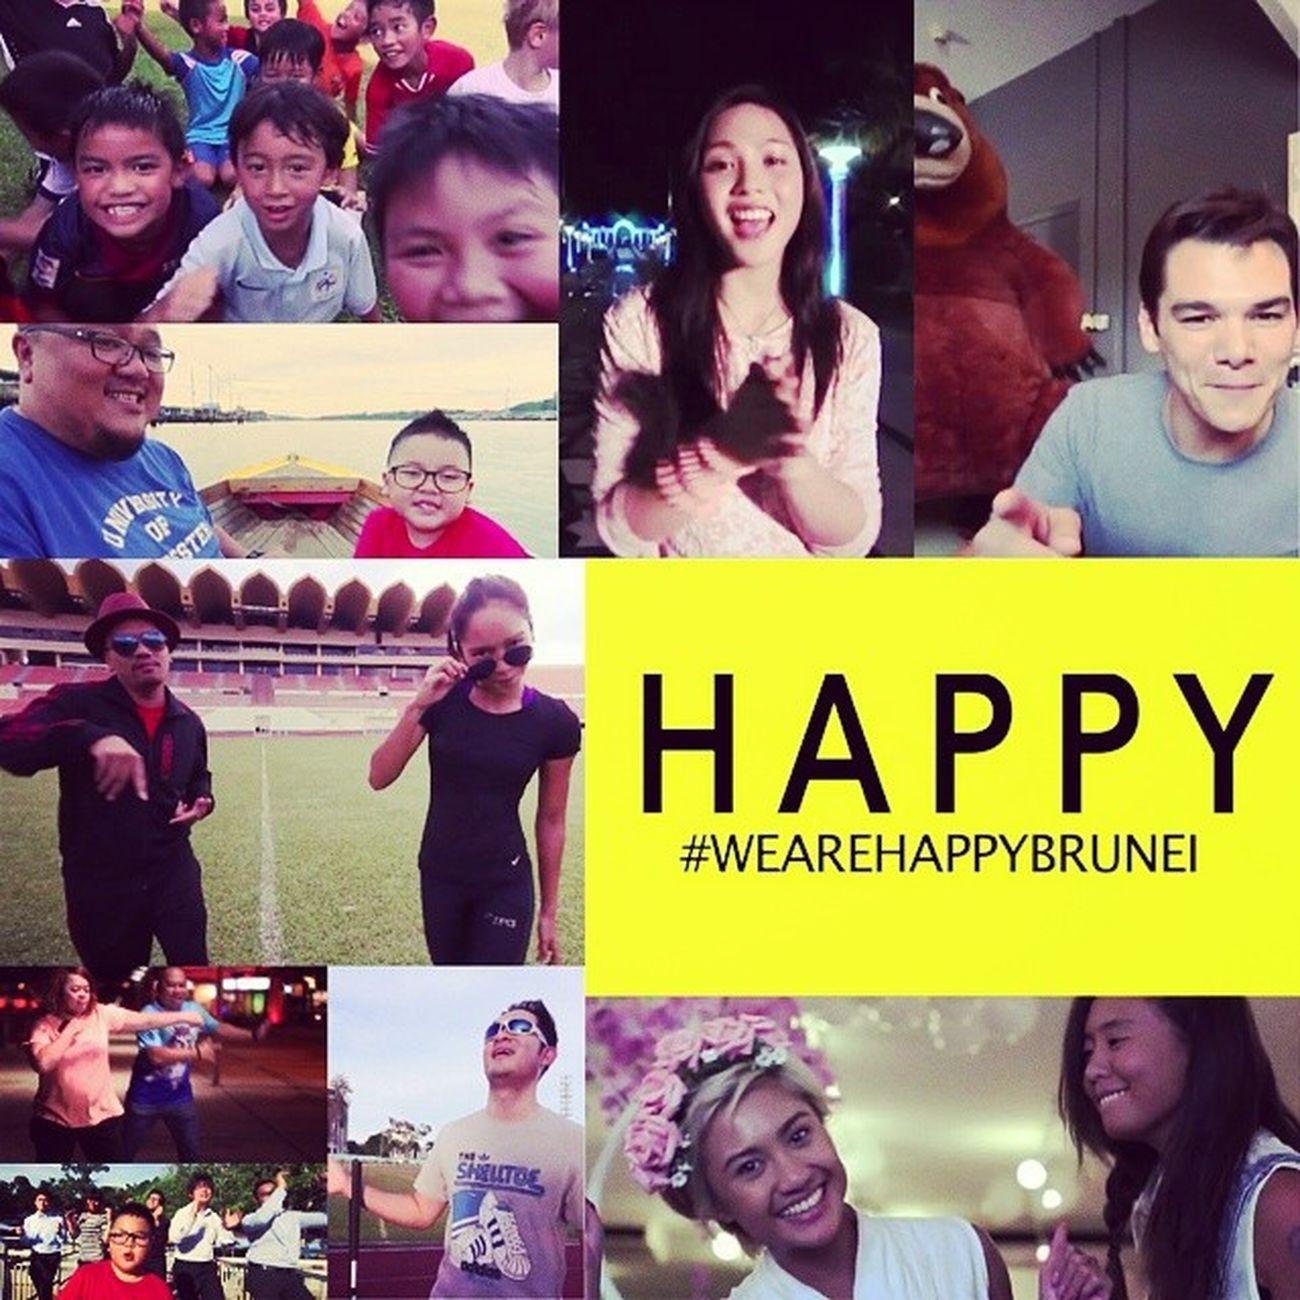 Have an awesome week ahead Brunei ! Have you seen the Wearehappybrunei clip? Awesomeness HappyBrunei happybn schoolholidays happeningsbn